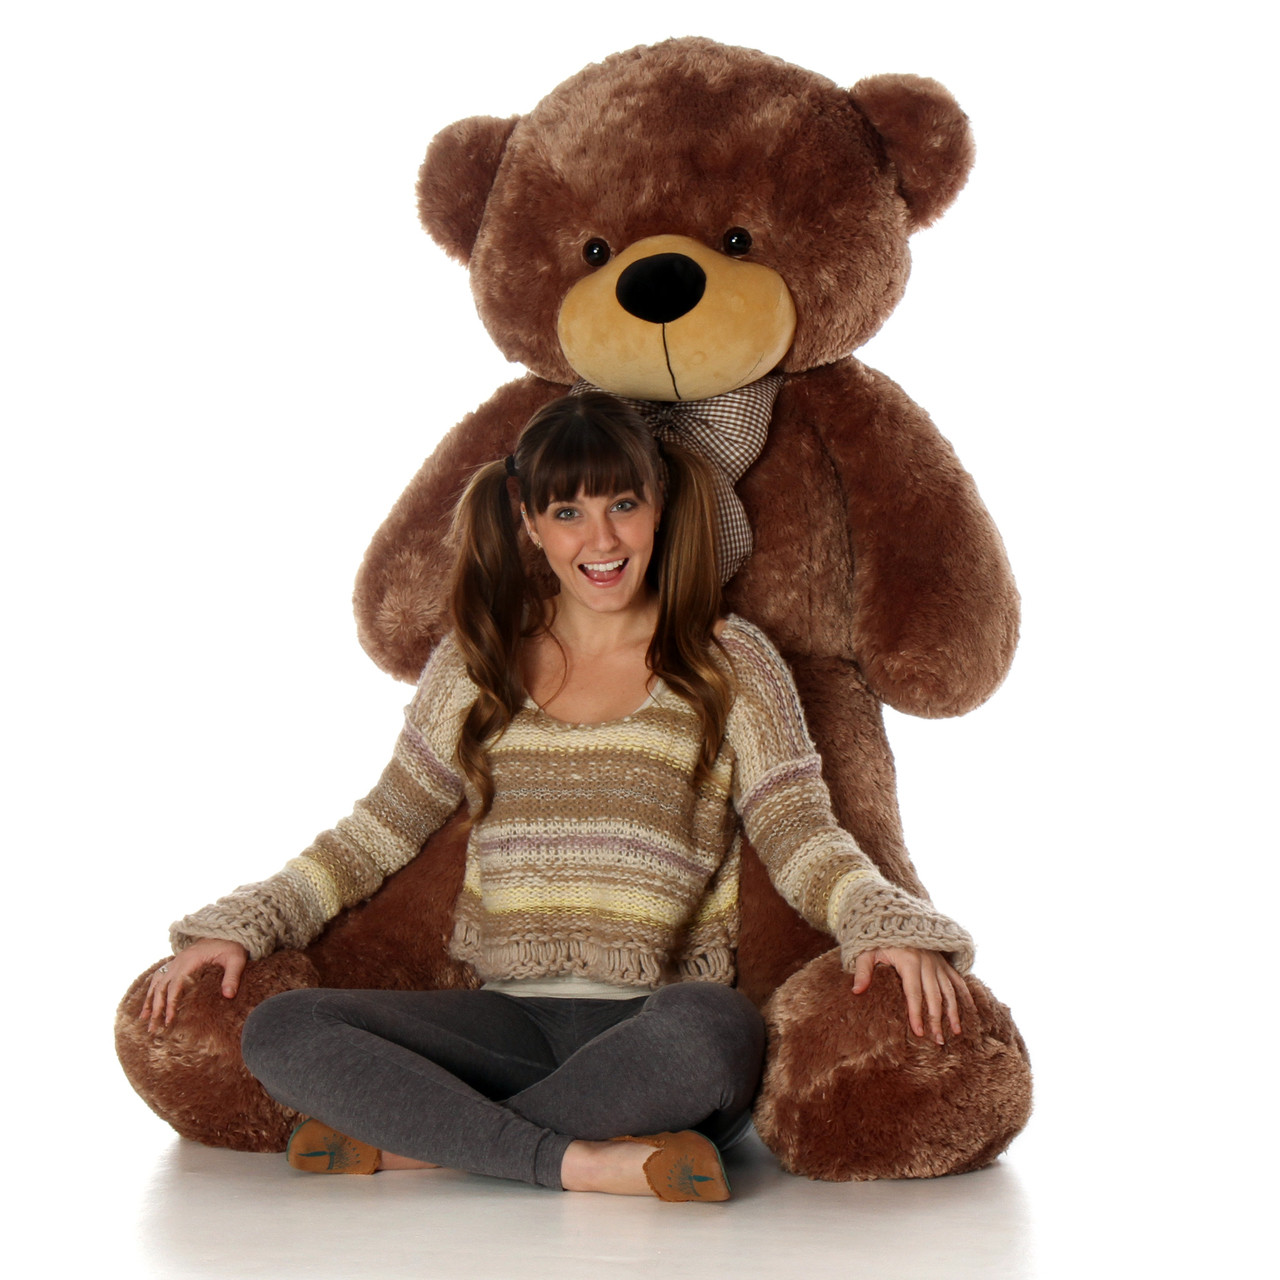 5ft Life Size Teddy Bear Sunny Cuddles beautifully soft mocha fur